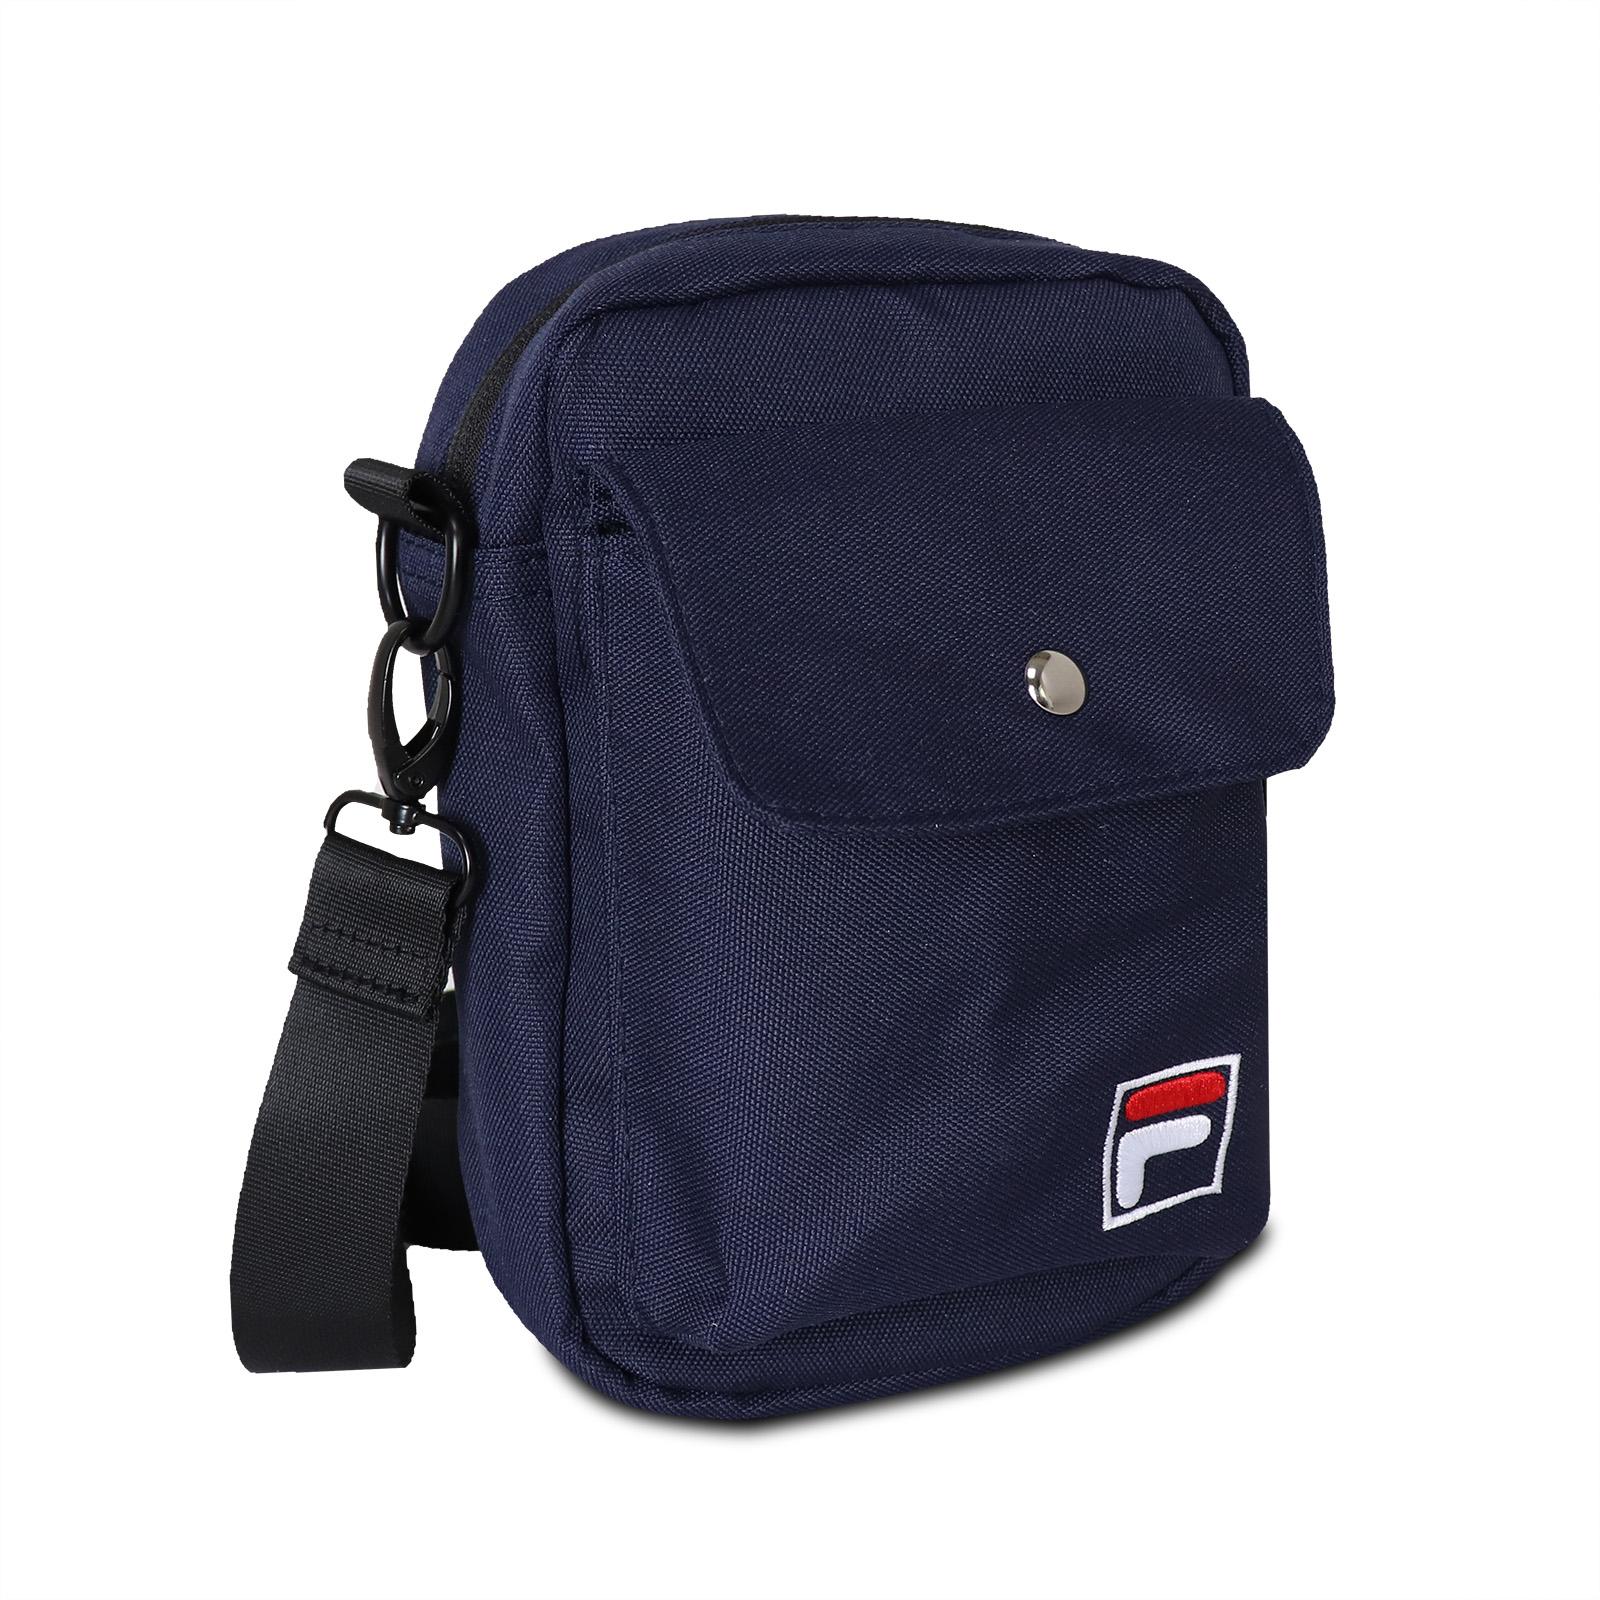 FILA 斜背包 Crossbody Shoulder Bag 藍 白 男女款 外出 側背【ACS】 BMV3014NV